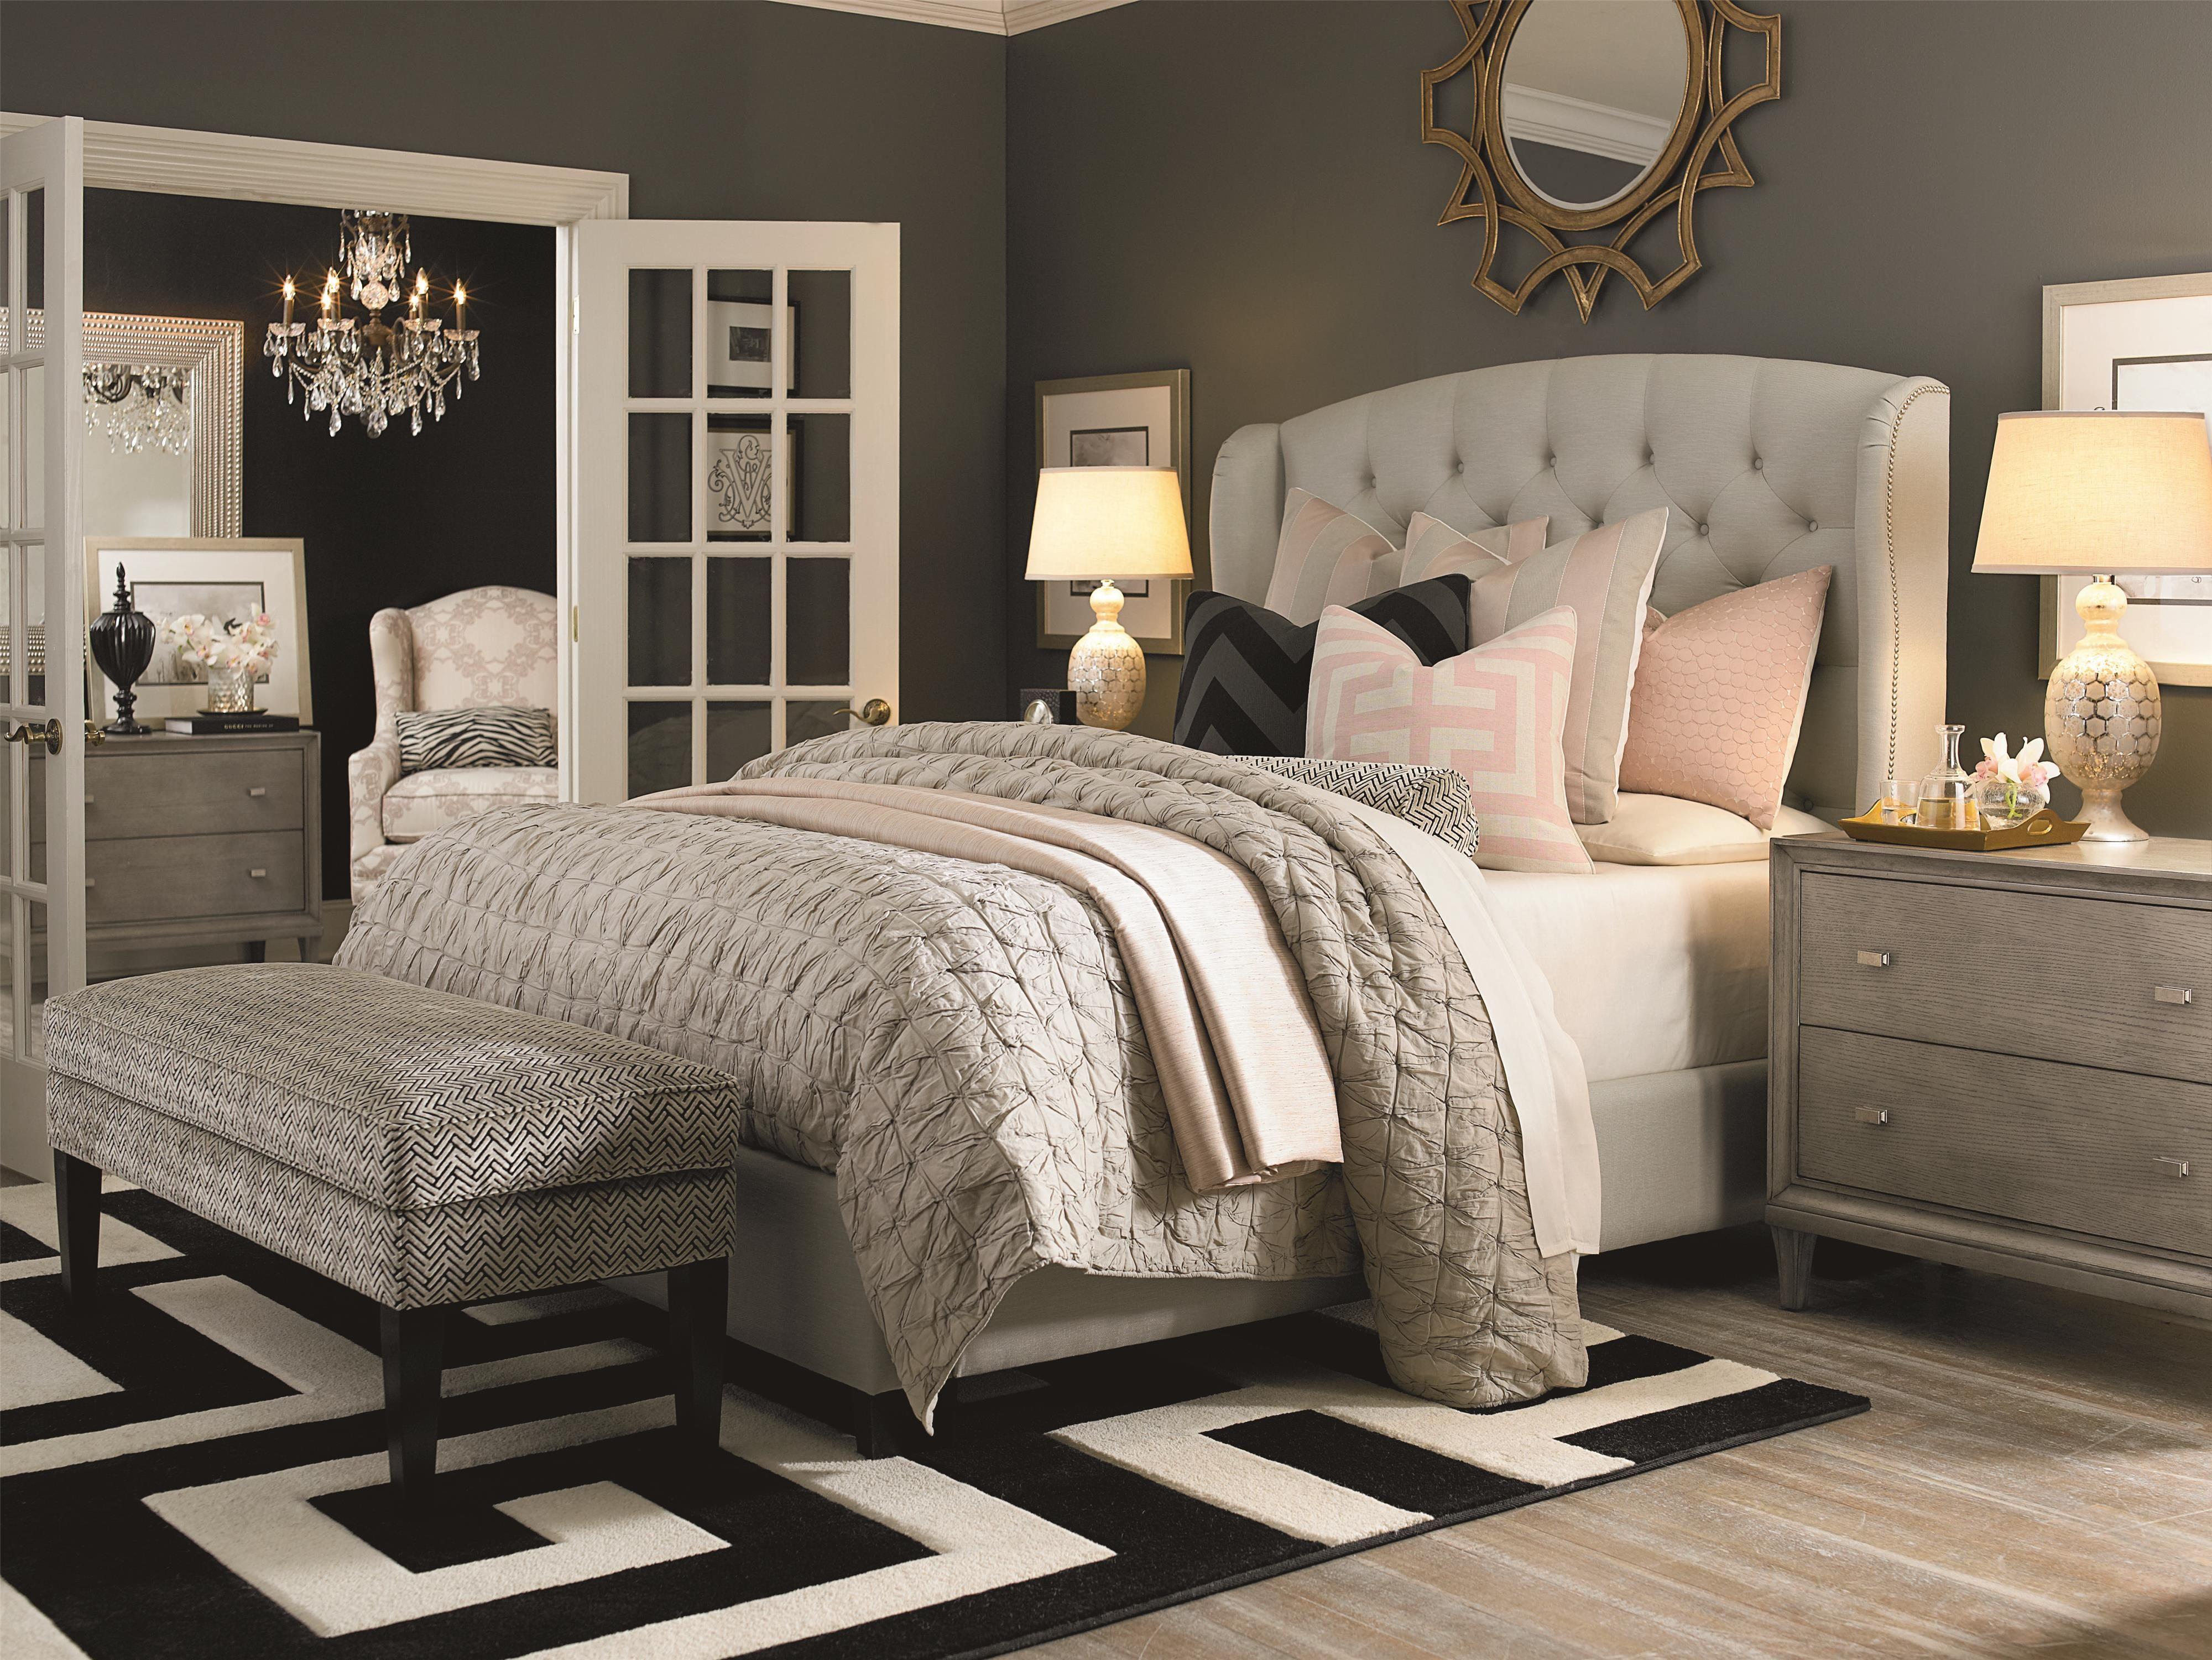 Master bedroom ideas  Customizable Bed from Hudsonus  Bedroom decor  Pinterest  Bedroom